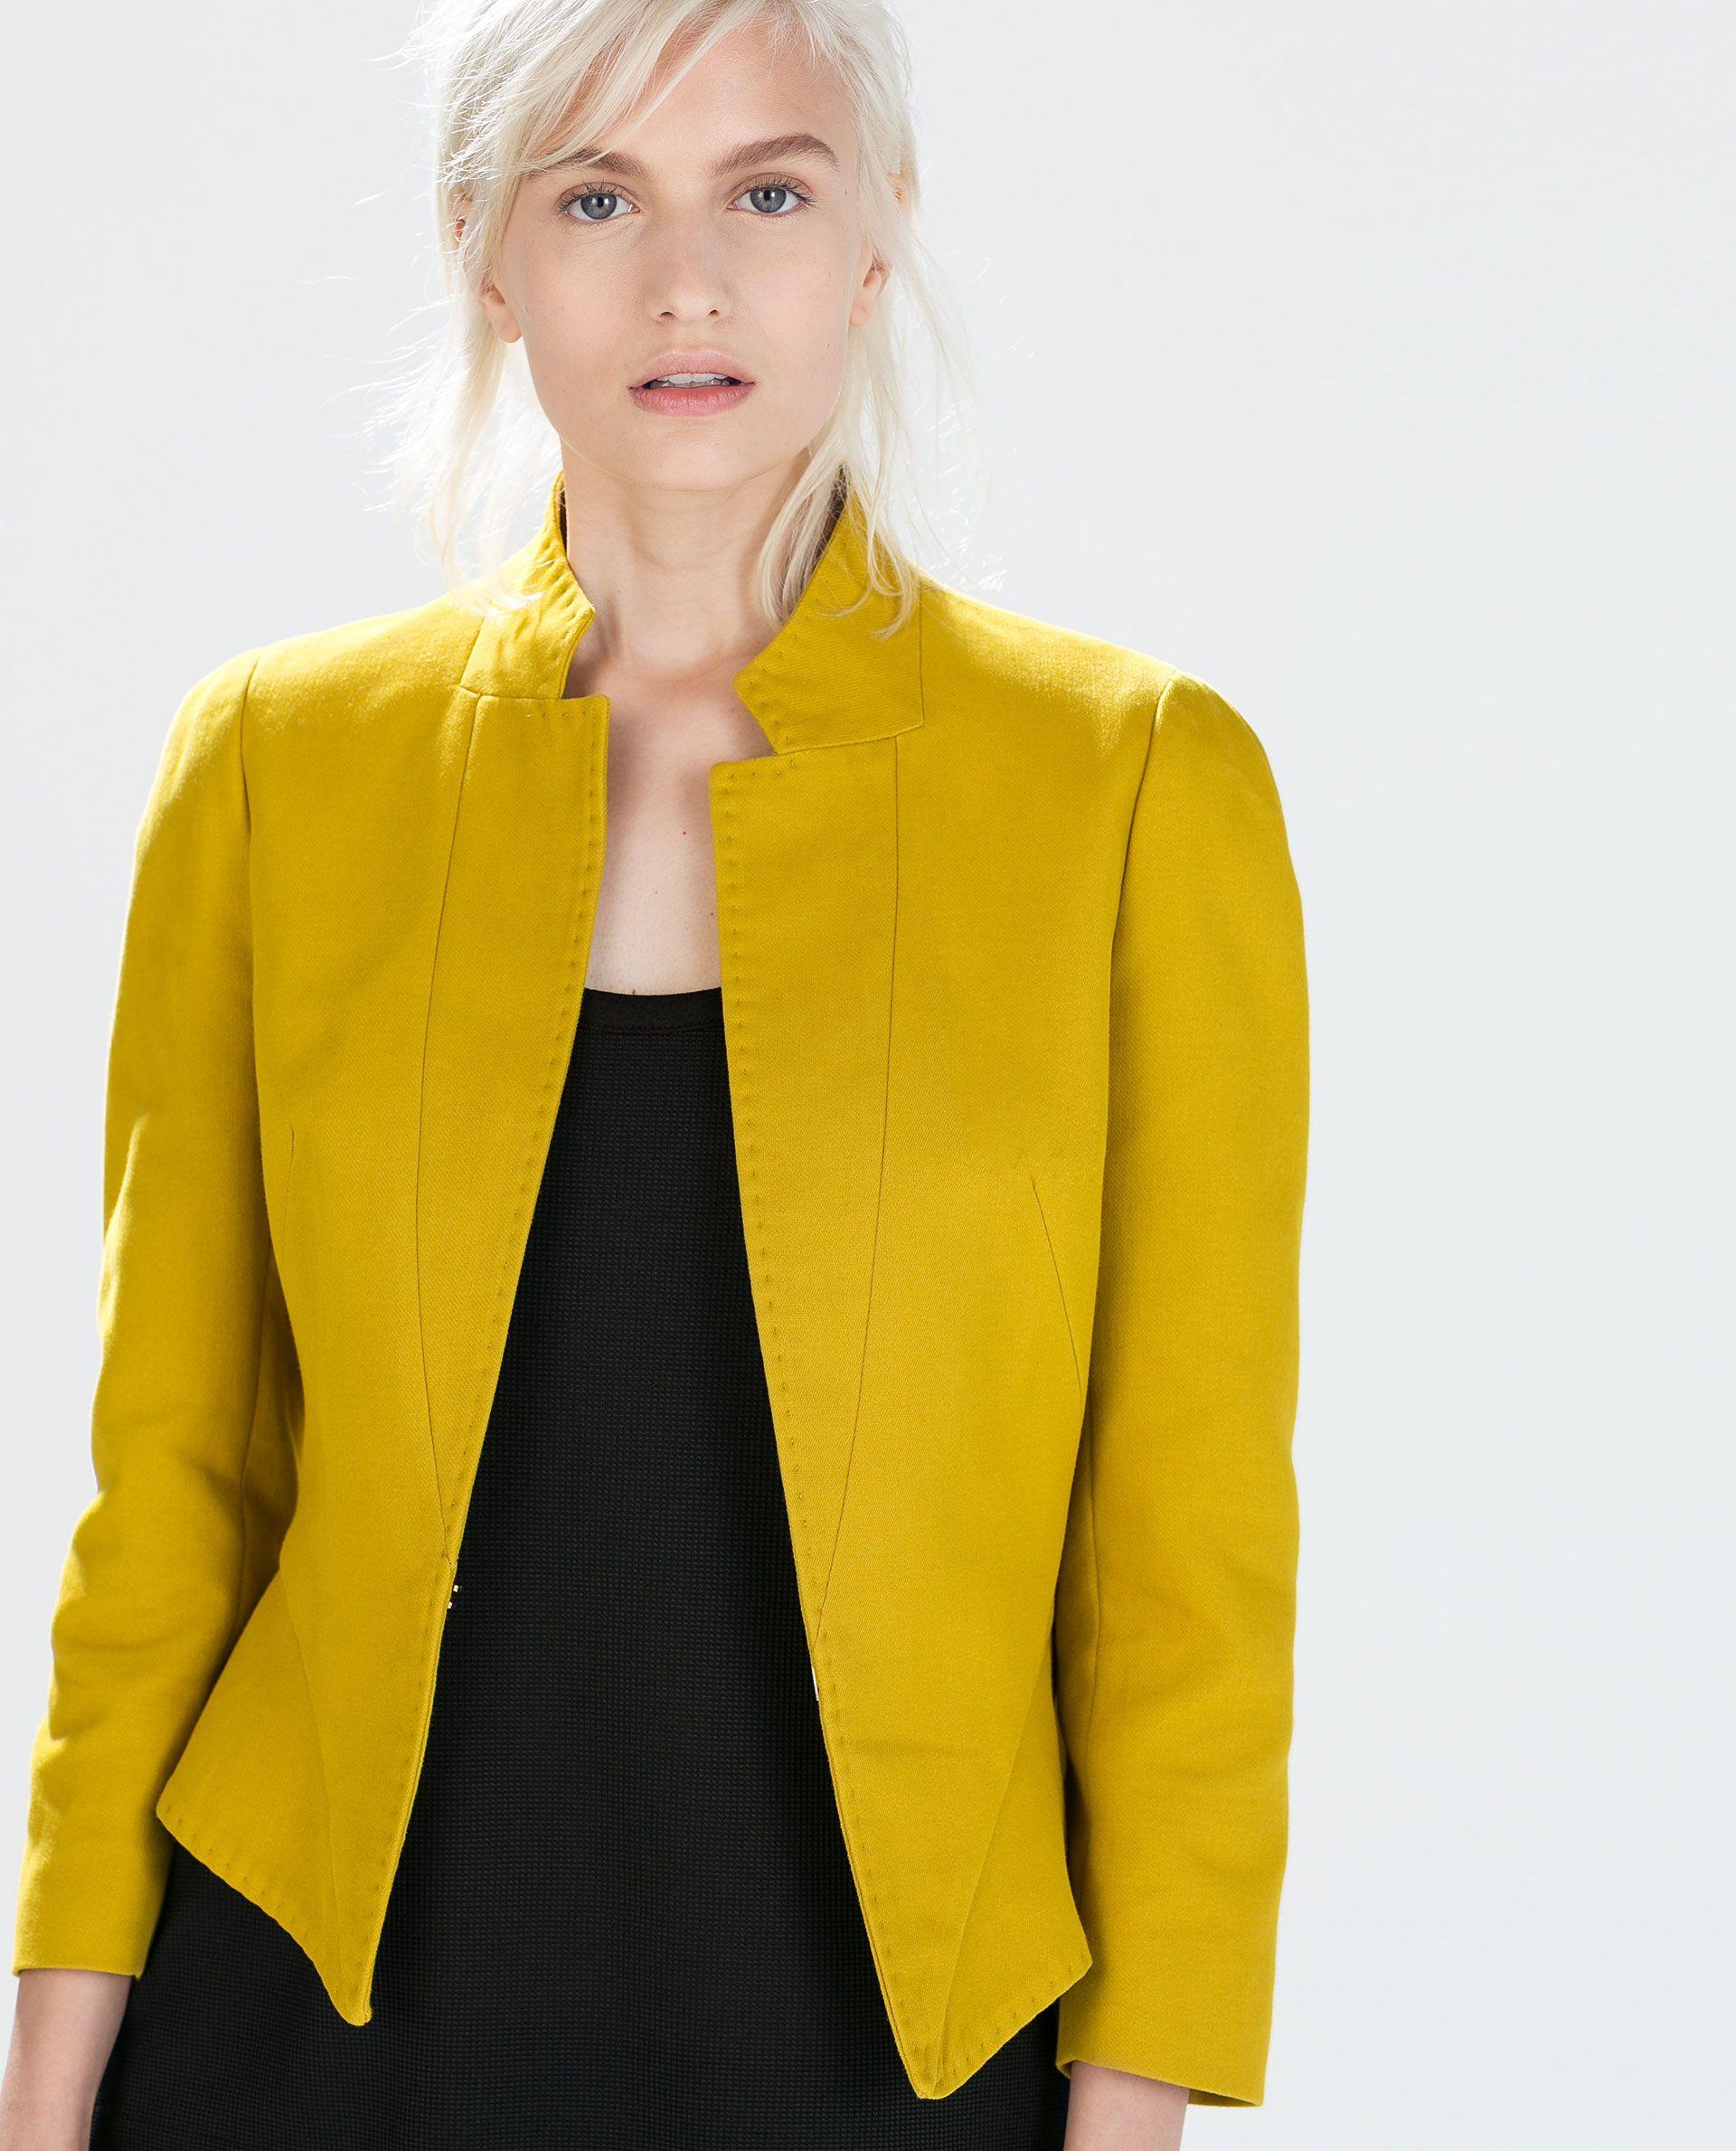 ZARA - WOMAN - PEPLUM BLAZER | costura | Pinterest | Peplum blazer ...